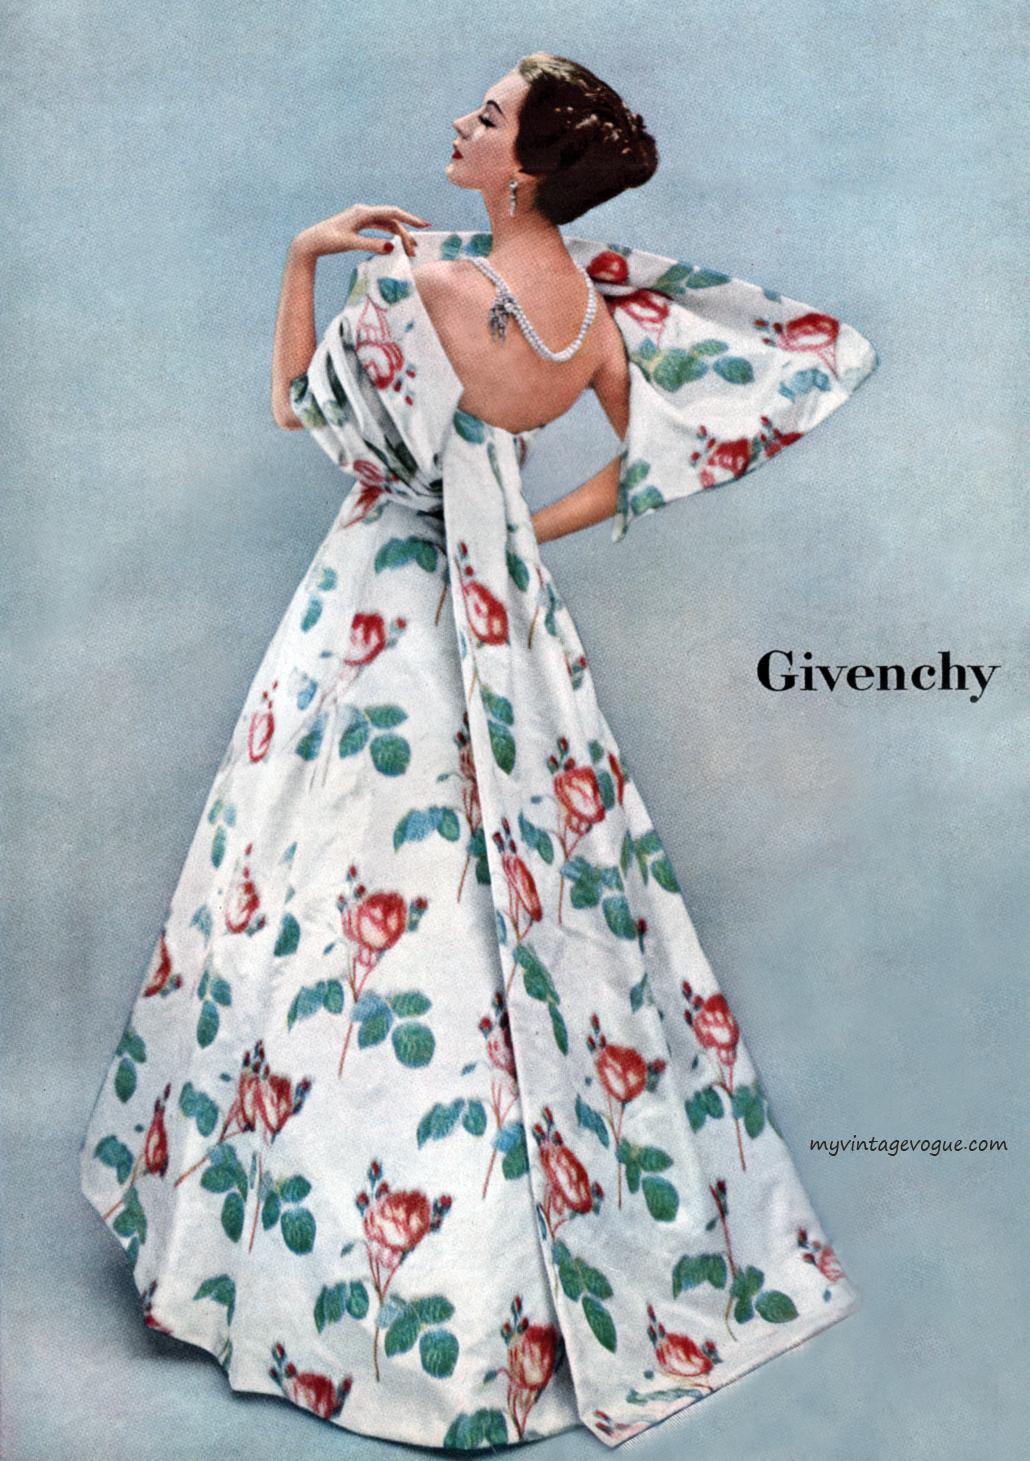 ladies-home-journal-1956-dovima-wearing-givenchy---photo-by-richard-avedon.jpg